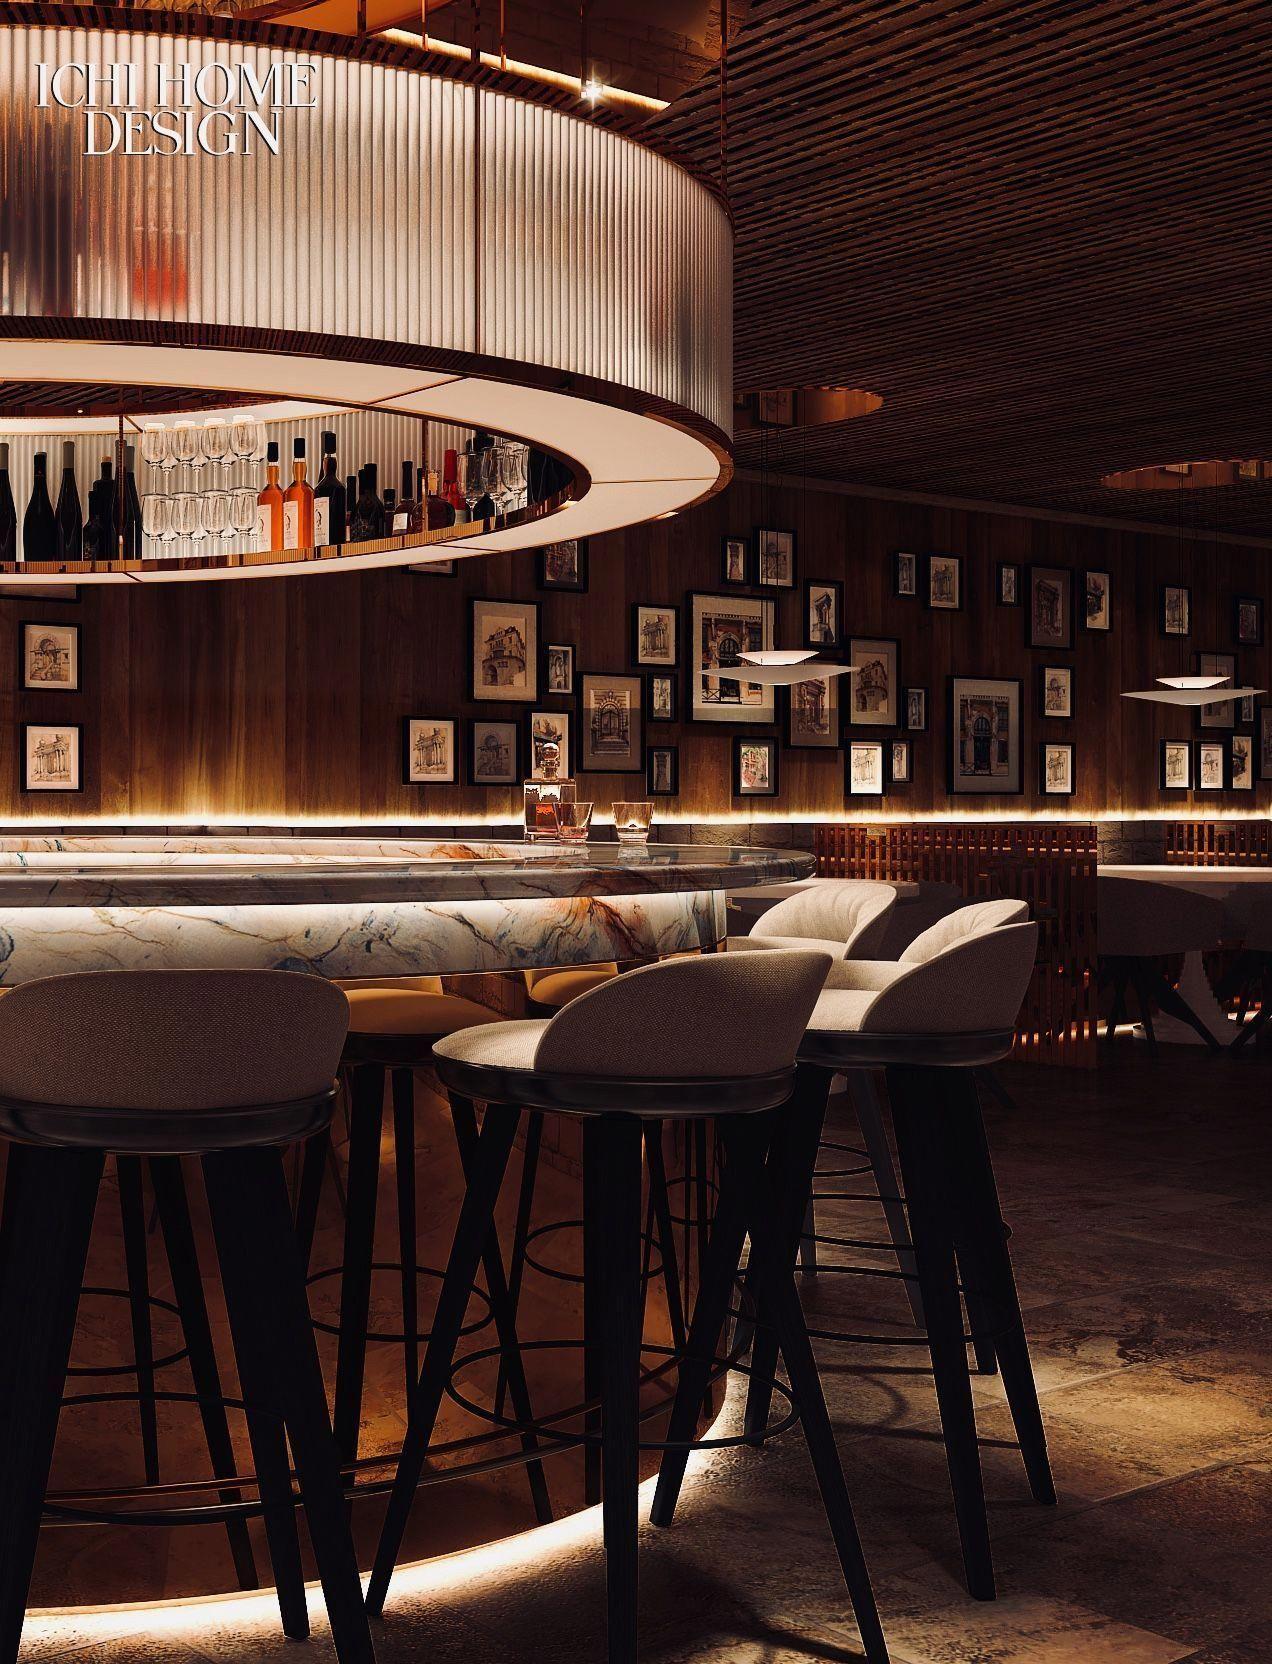 Interior Decor Inspiration For Your Restaurant Bar Find More At